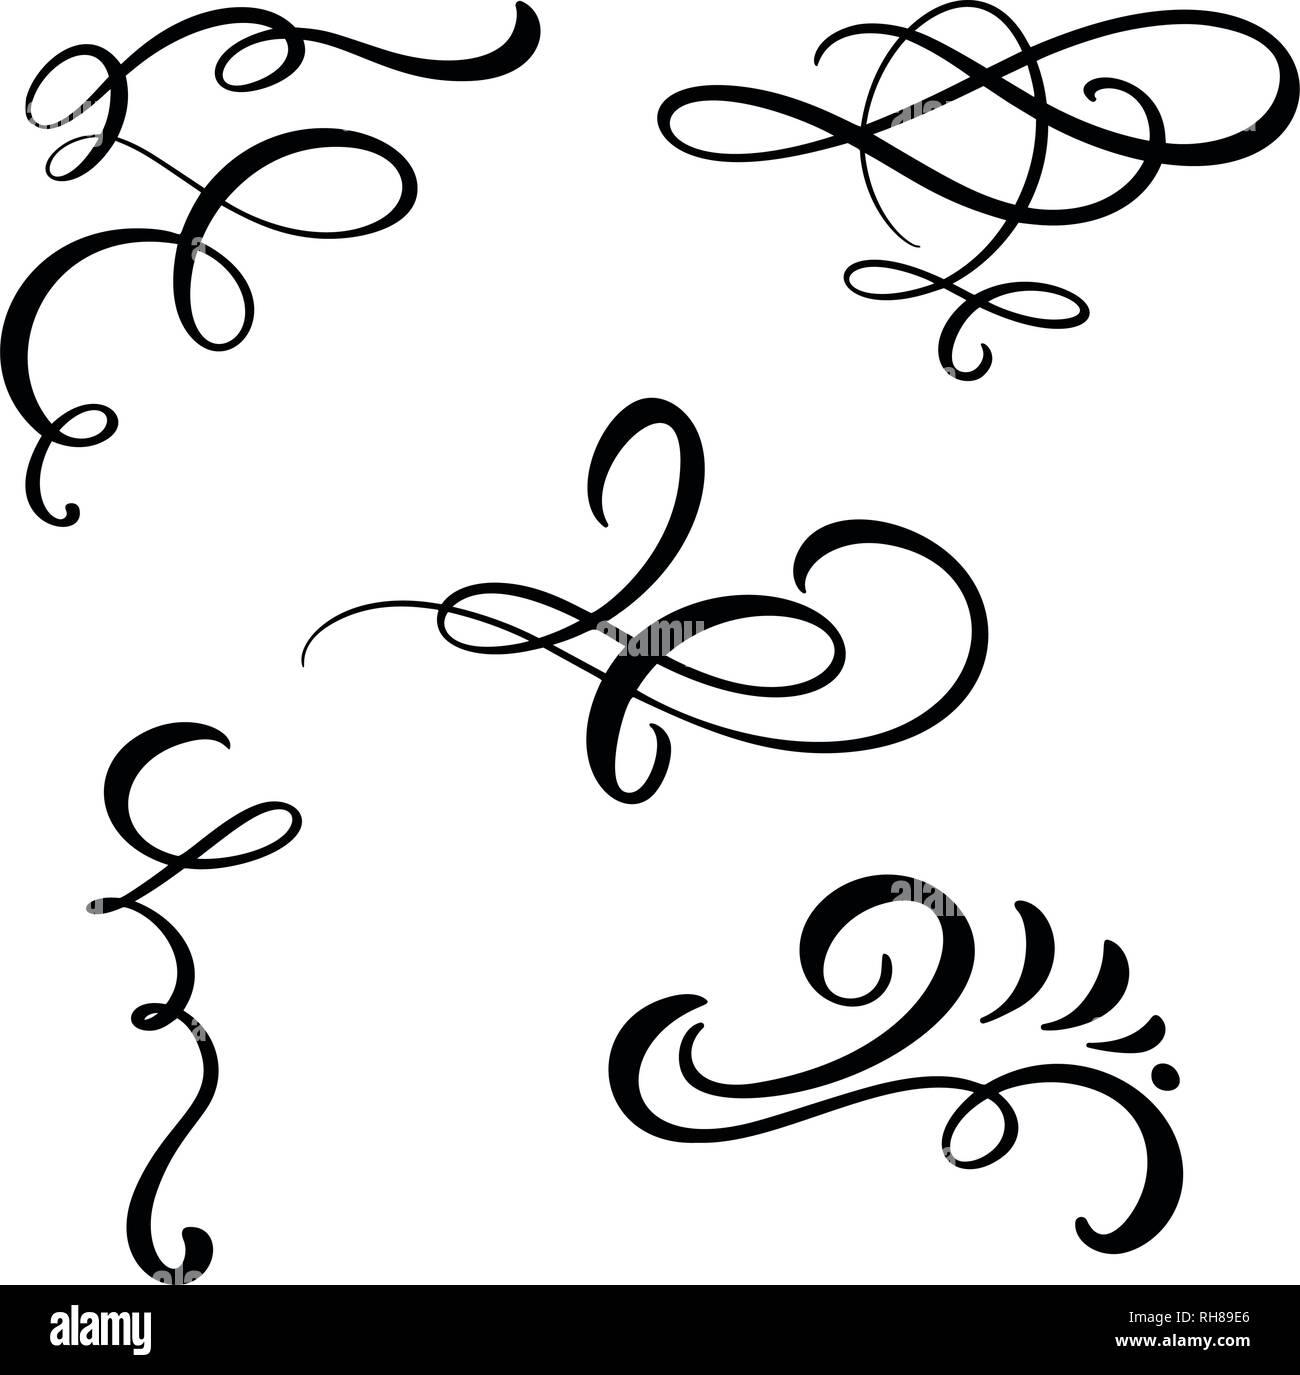 Set of vector vintage line elegant dividers and separators, swirl and corner decorative ornaments. Floral line filigree design elements. Flourish curl - Stock Image